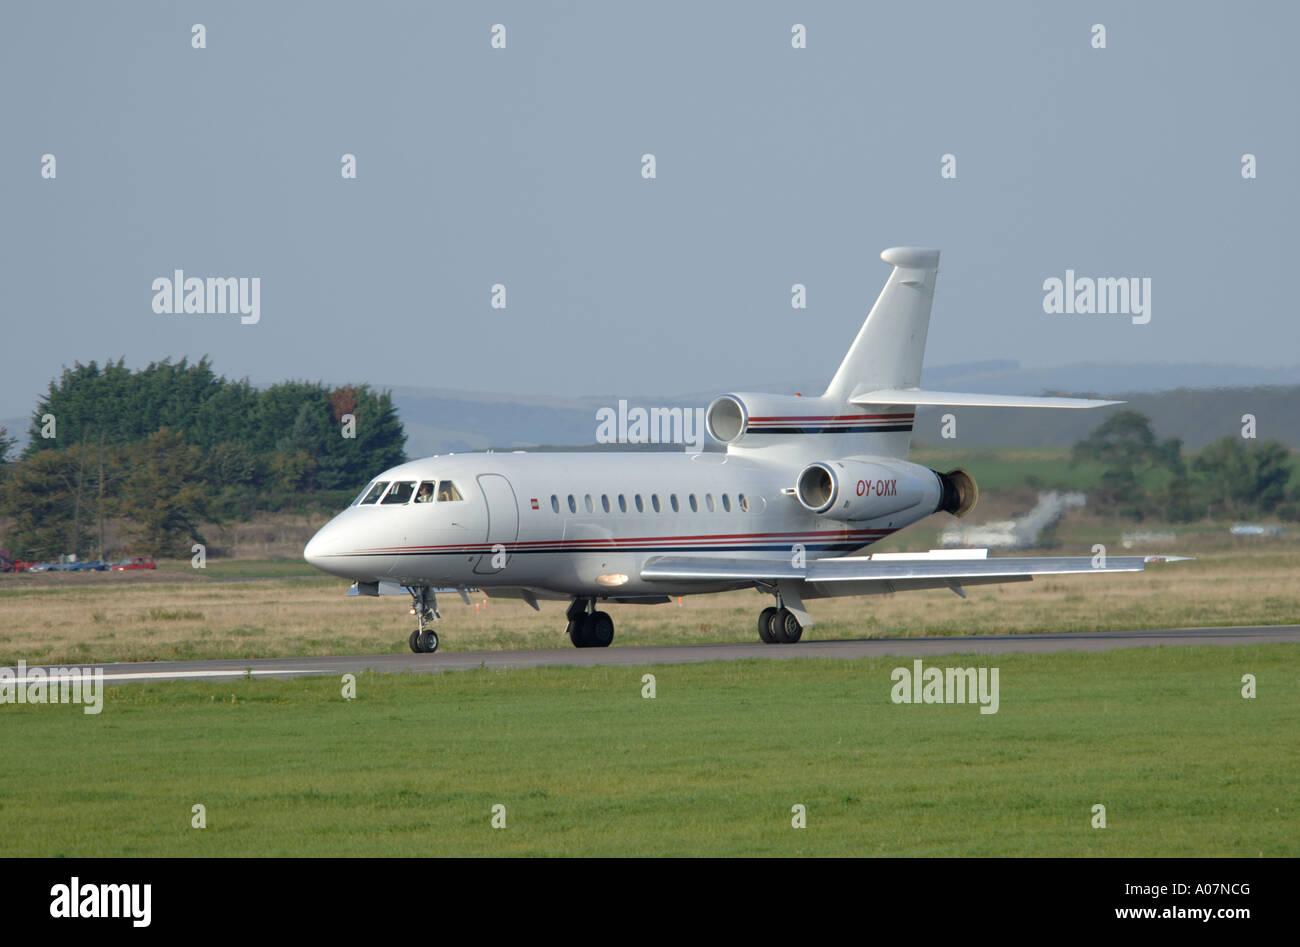 Dassault Falcon 900 super large Tri Jet departing Inverness Dalcross Airport.  XAV 3994-380 - Stock Image